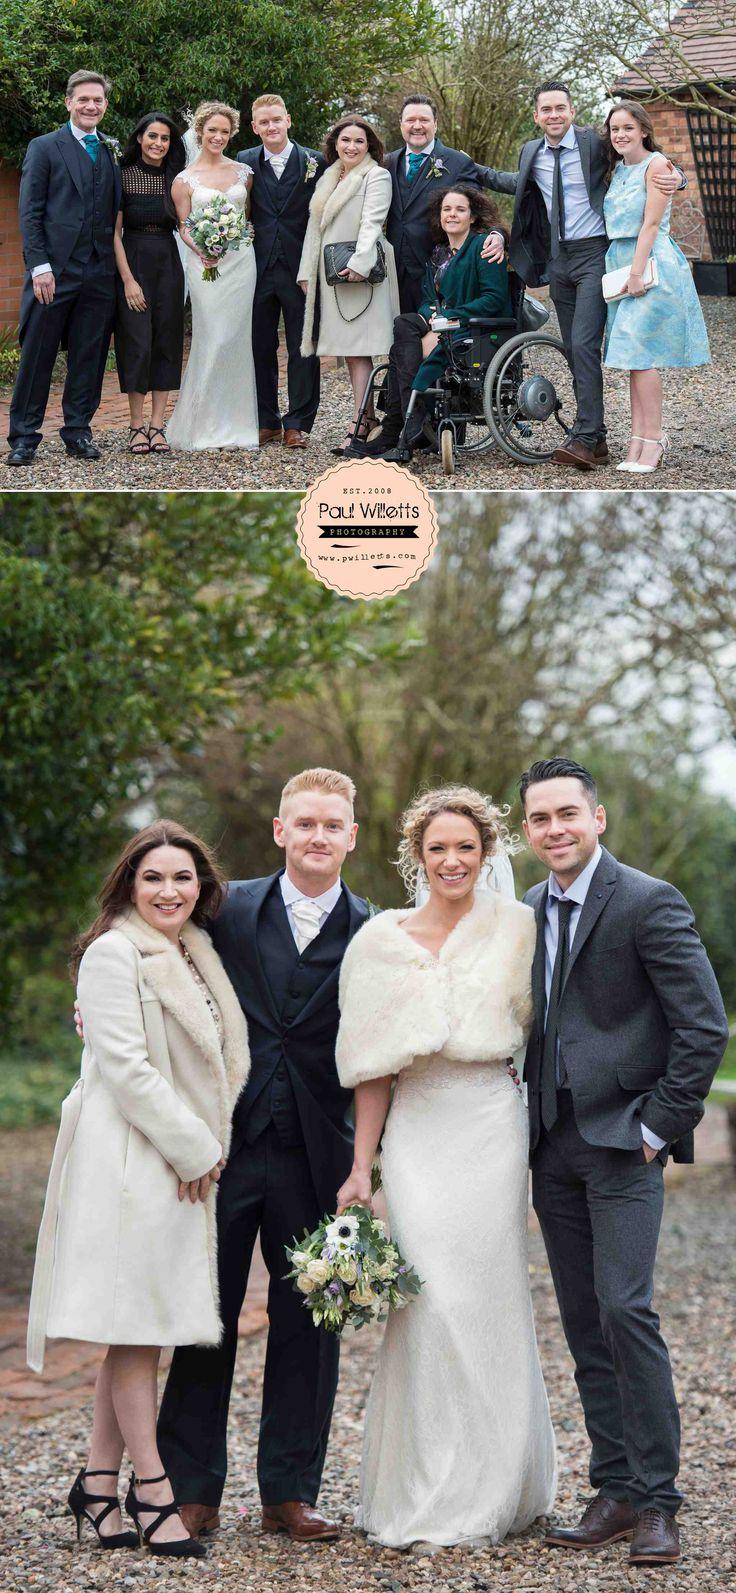 asian wedding photography east midlands%0A Mikey North Coronation Street Celebrity Wedding